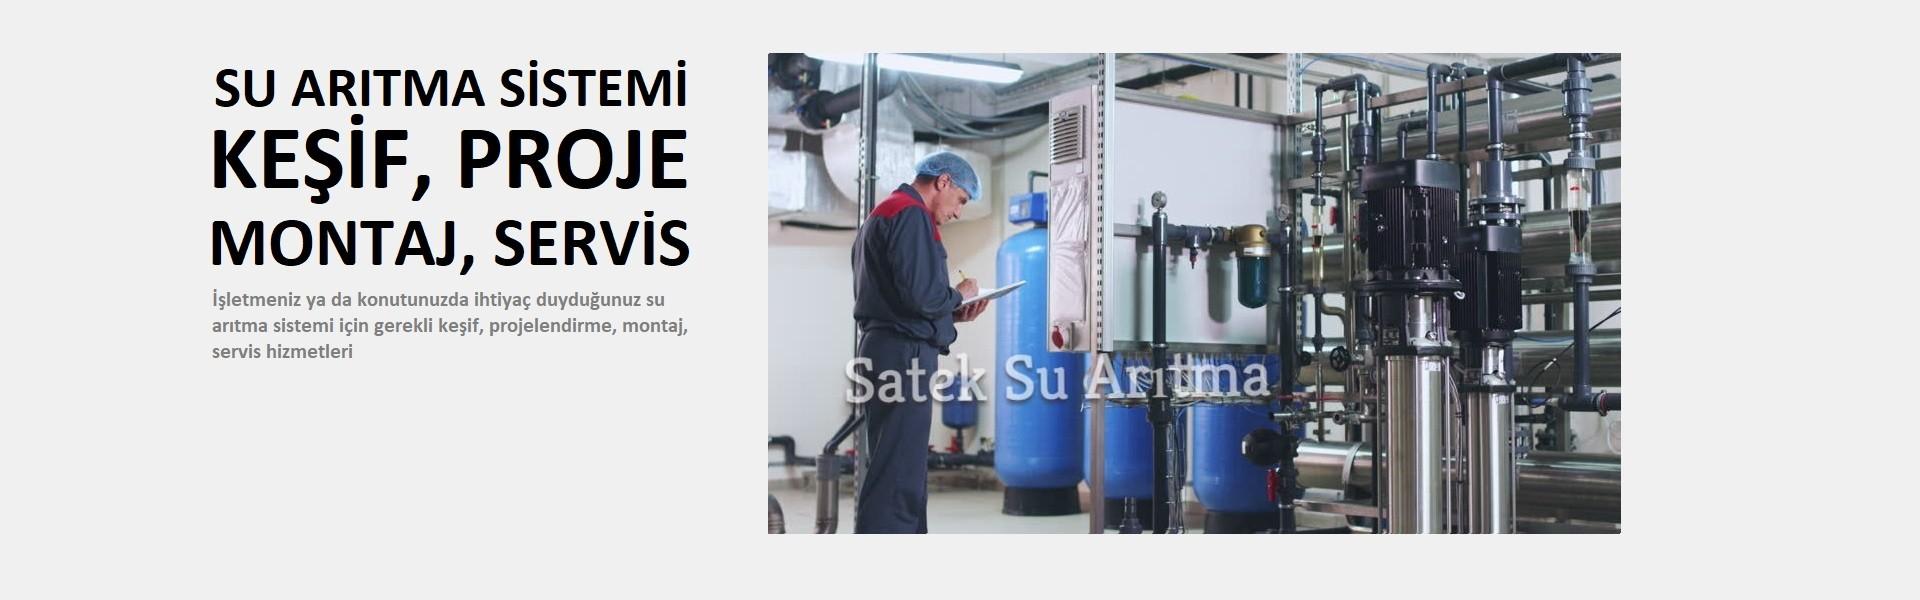 Su Arıtma Sistemi Keşif, Projelendirme, Montaj, Servis Hizmetleri